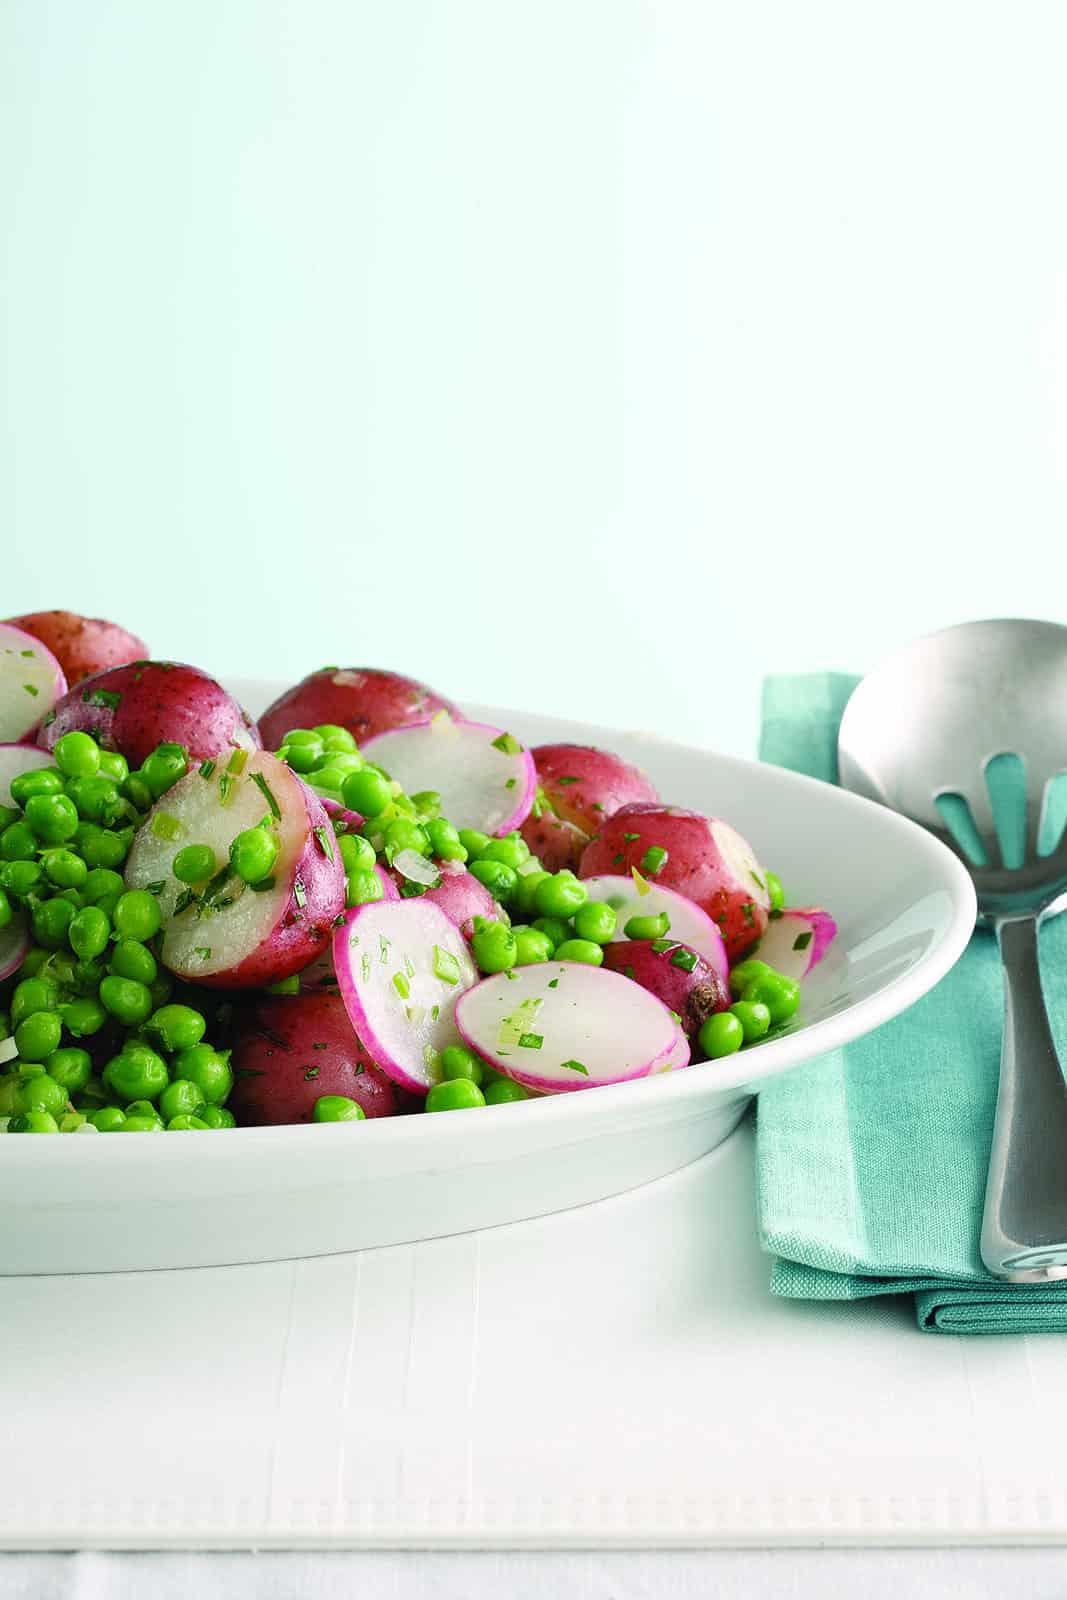 MAYJUN08_1645 potato salad w peas